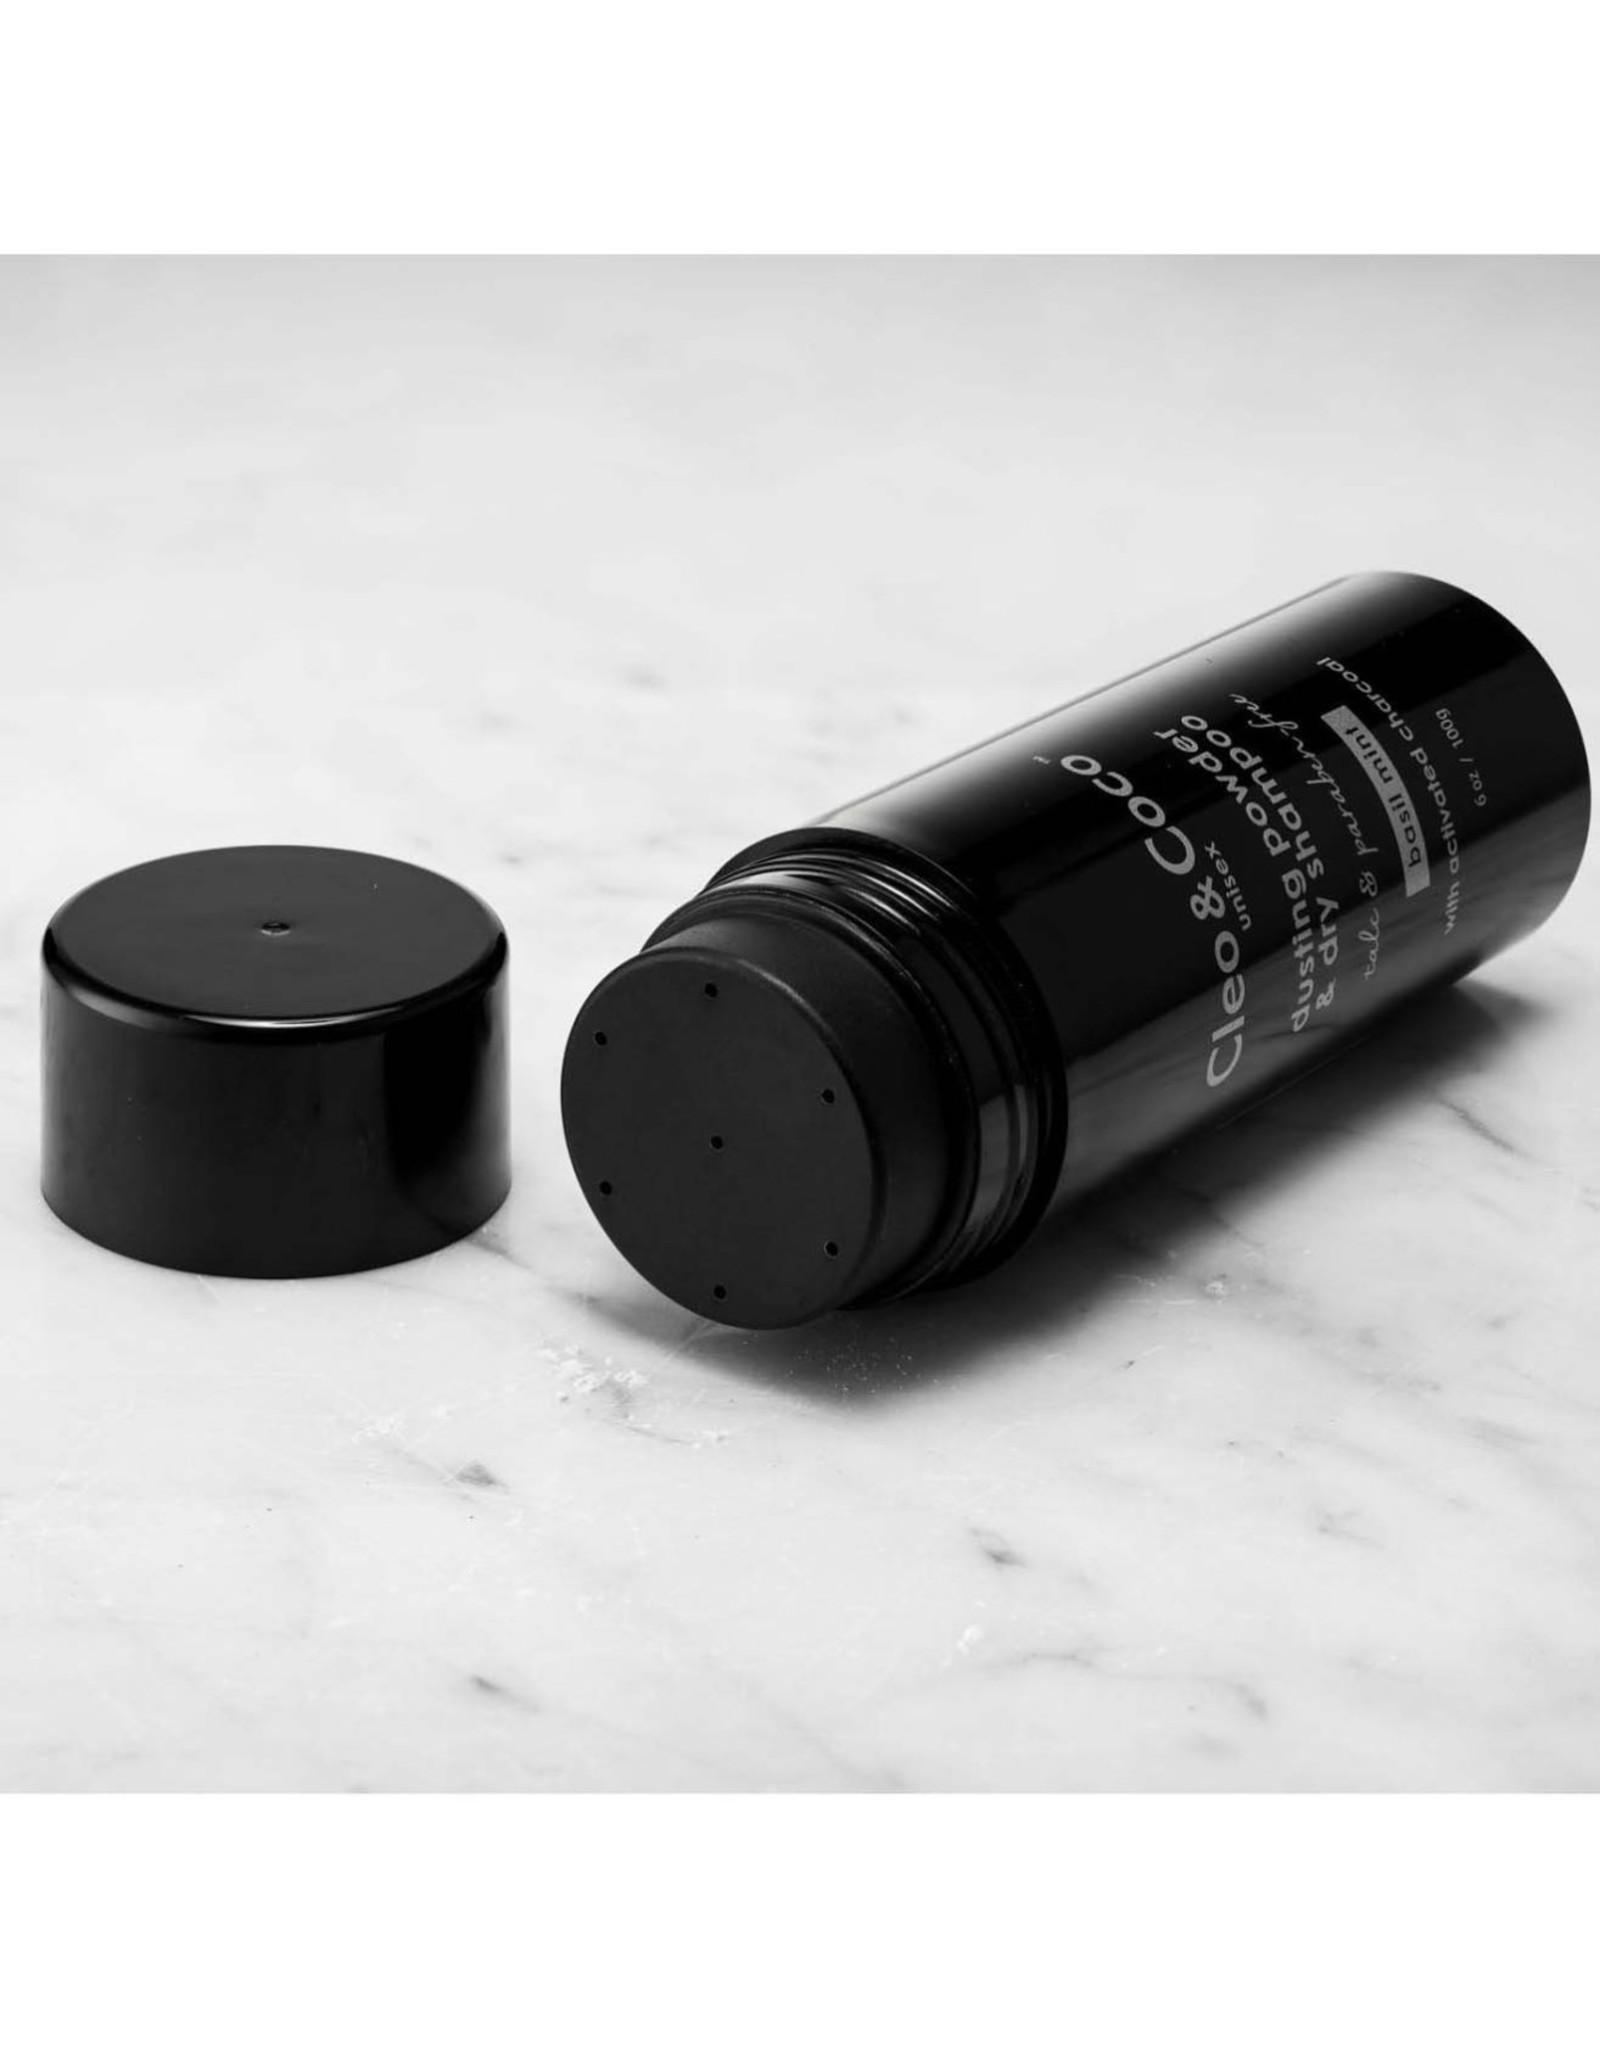 Basil Mint Dusting Powder & Dry Shampoo